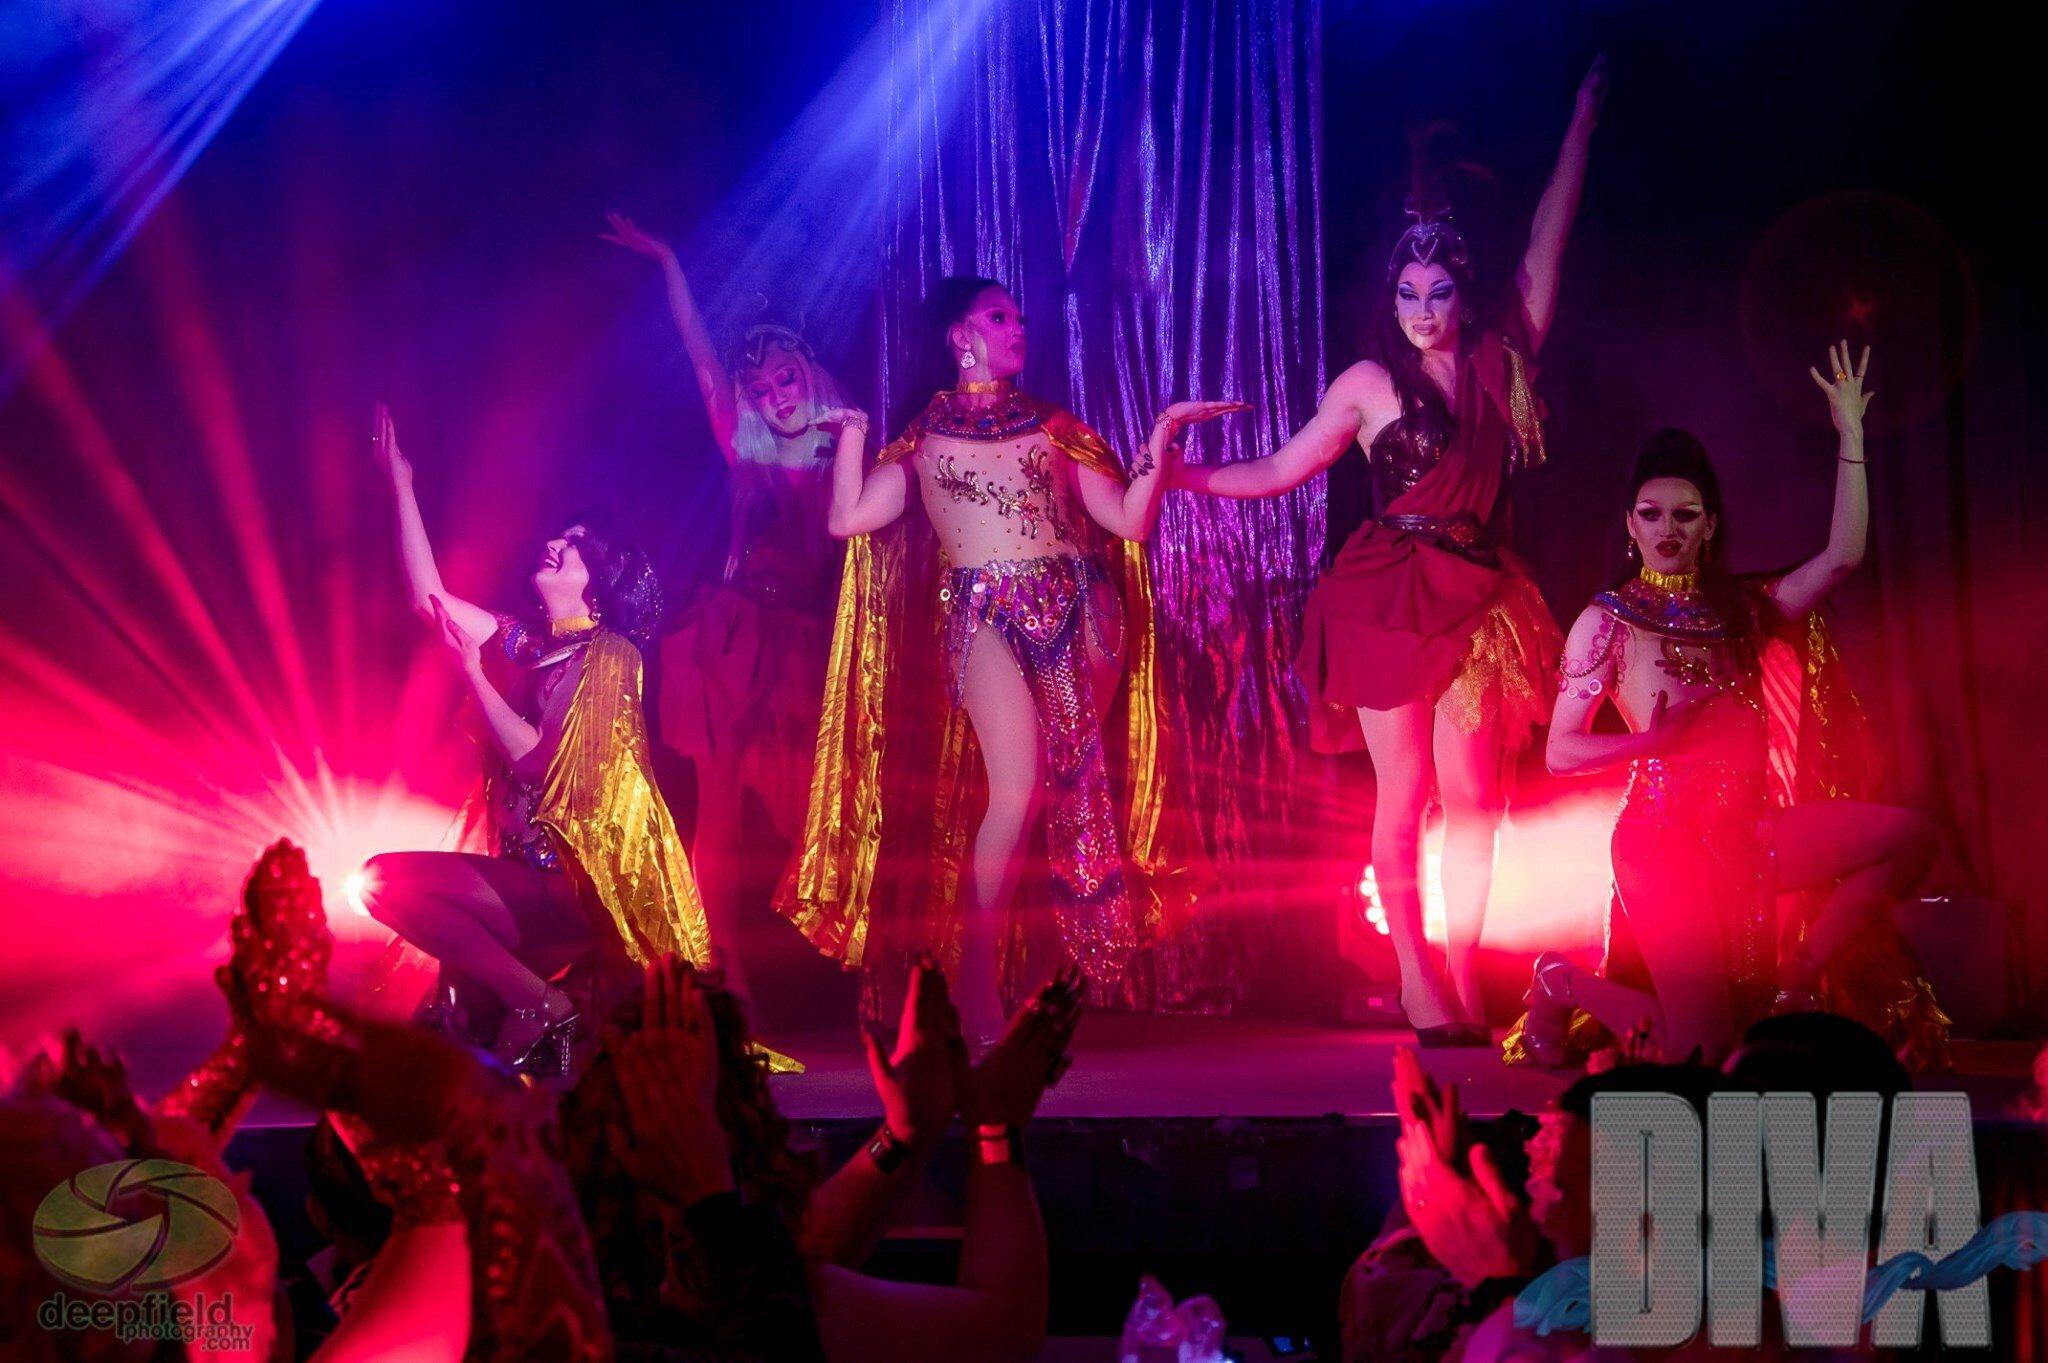 slay-2-stay-danni-issues-mynx-moscato-show-entertainment-diva-awards-sydney-drag-queen-royalty-best-hire-drag-race-australia.jpg